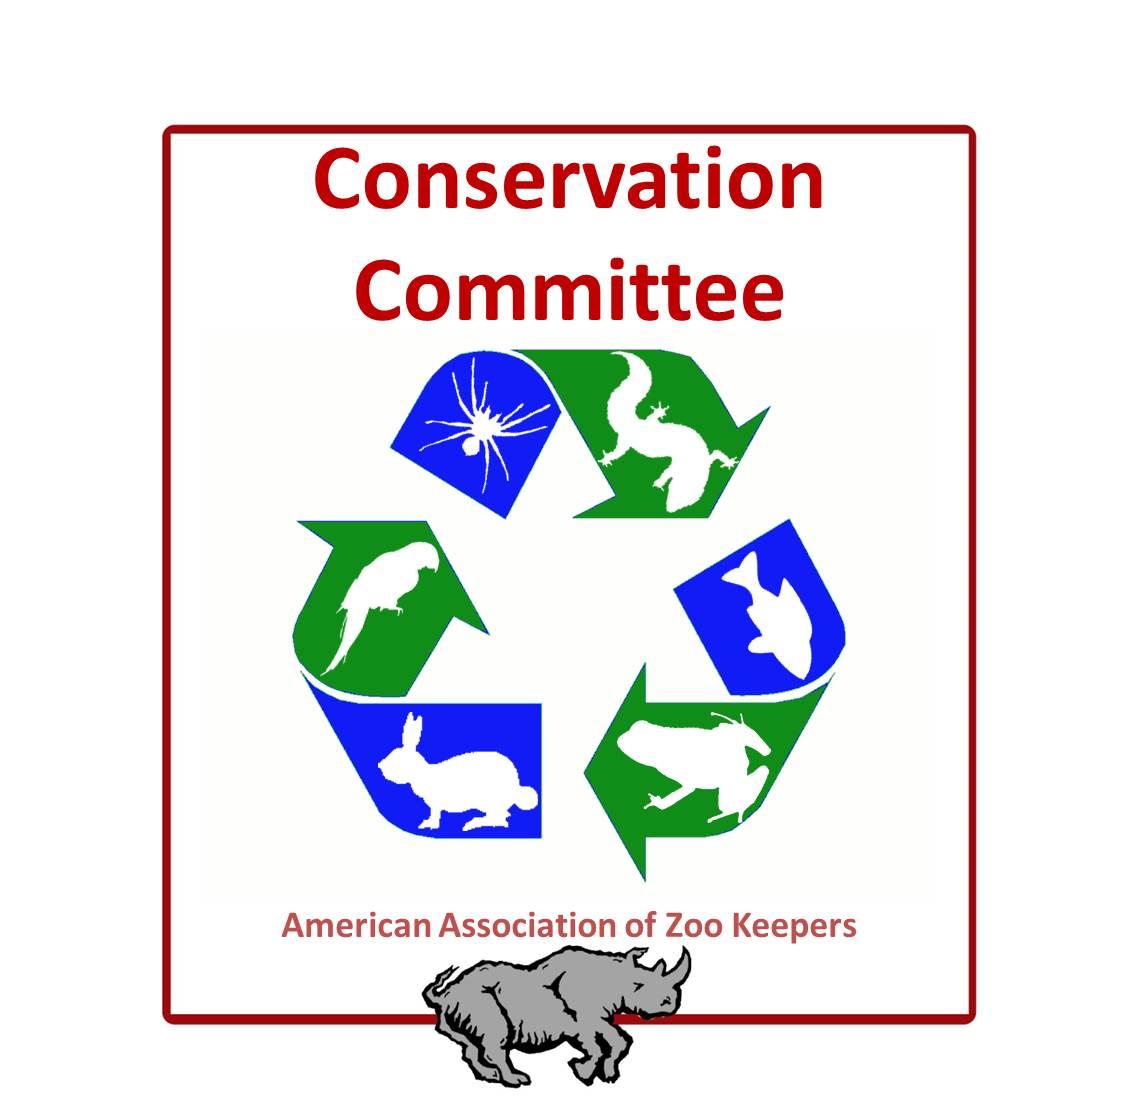 conservationlogo